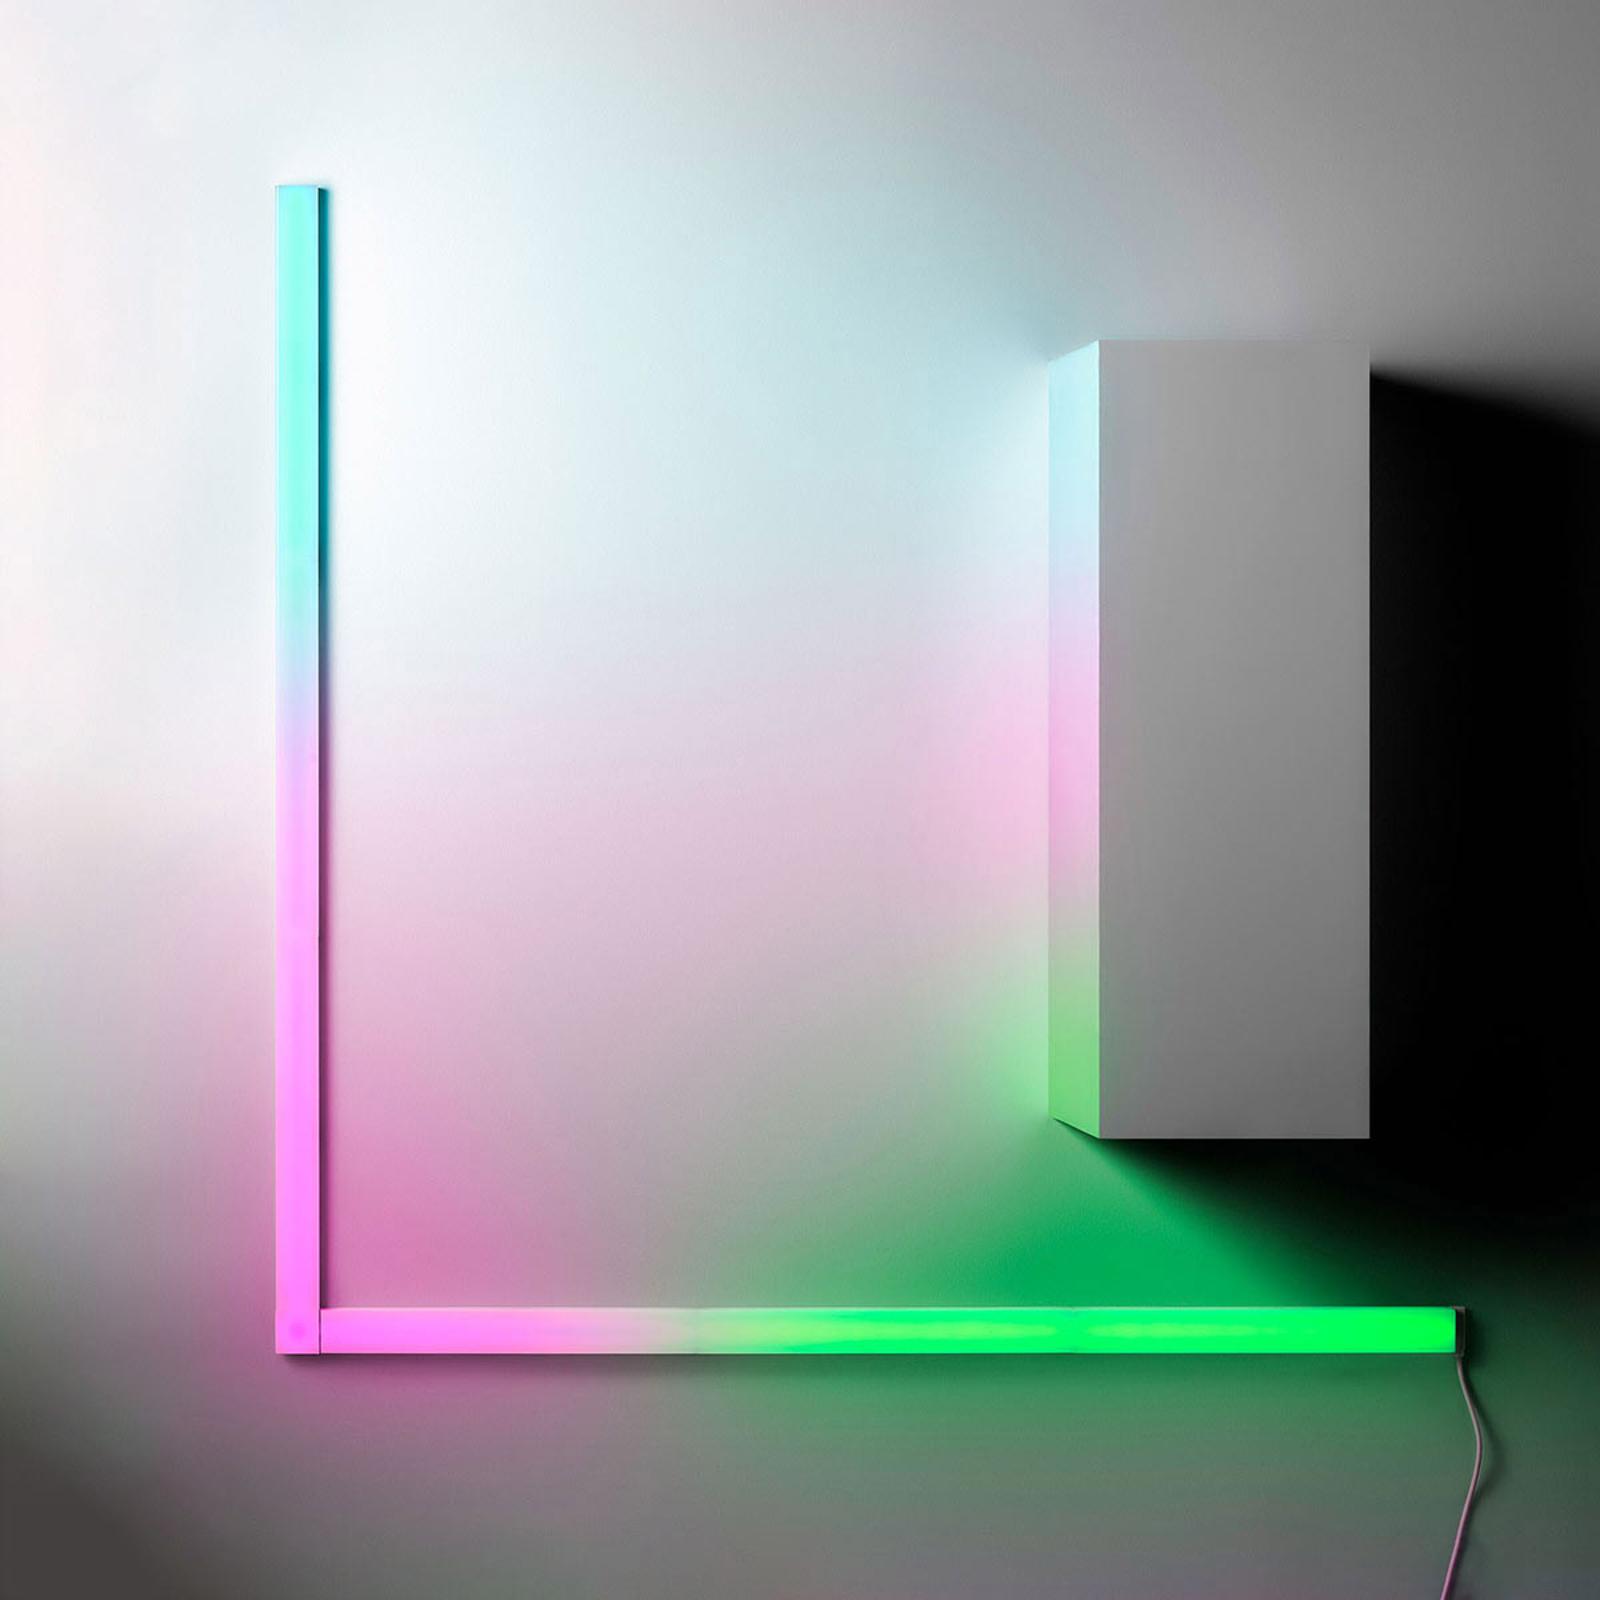 LIFX Beam Kit, modulare LED-Leuchte, WLAN-fähig